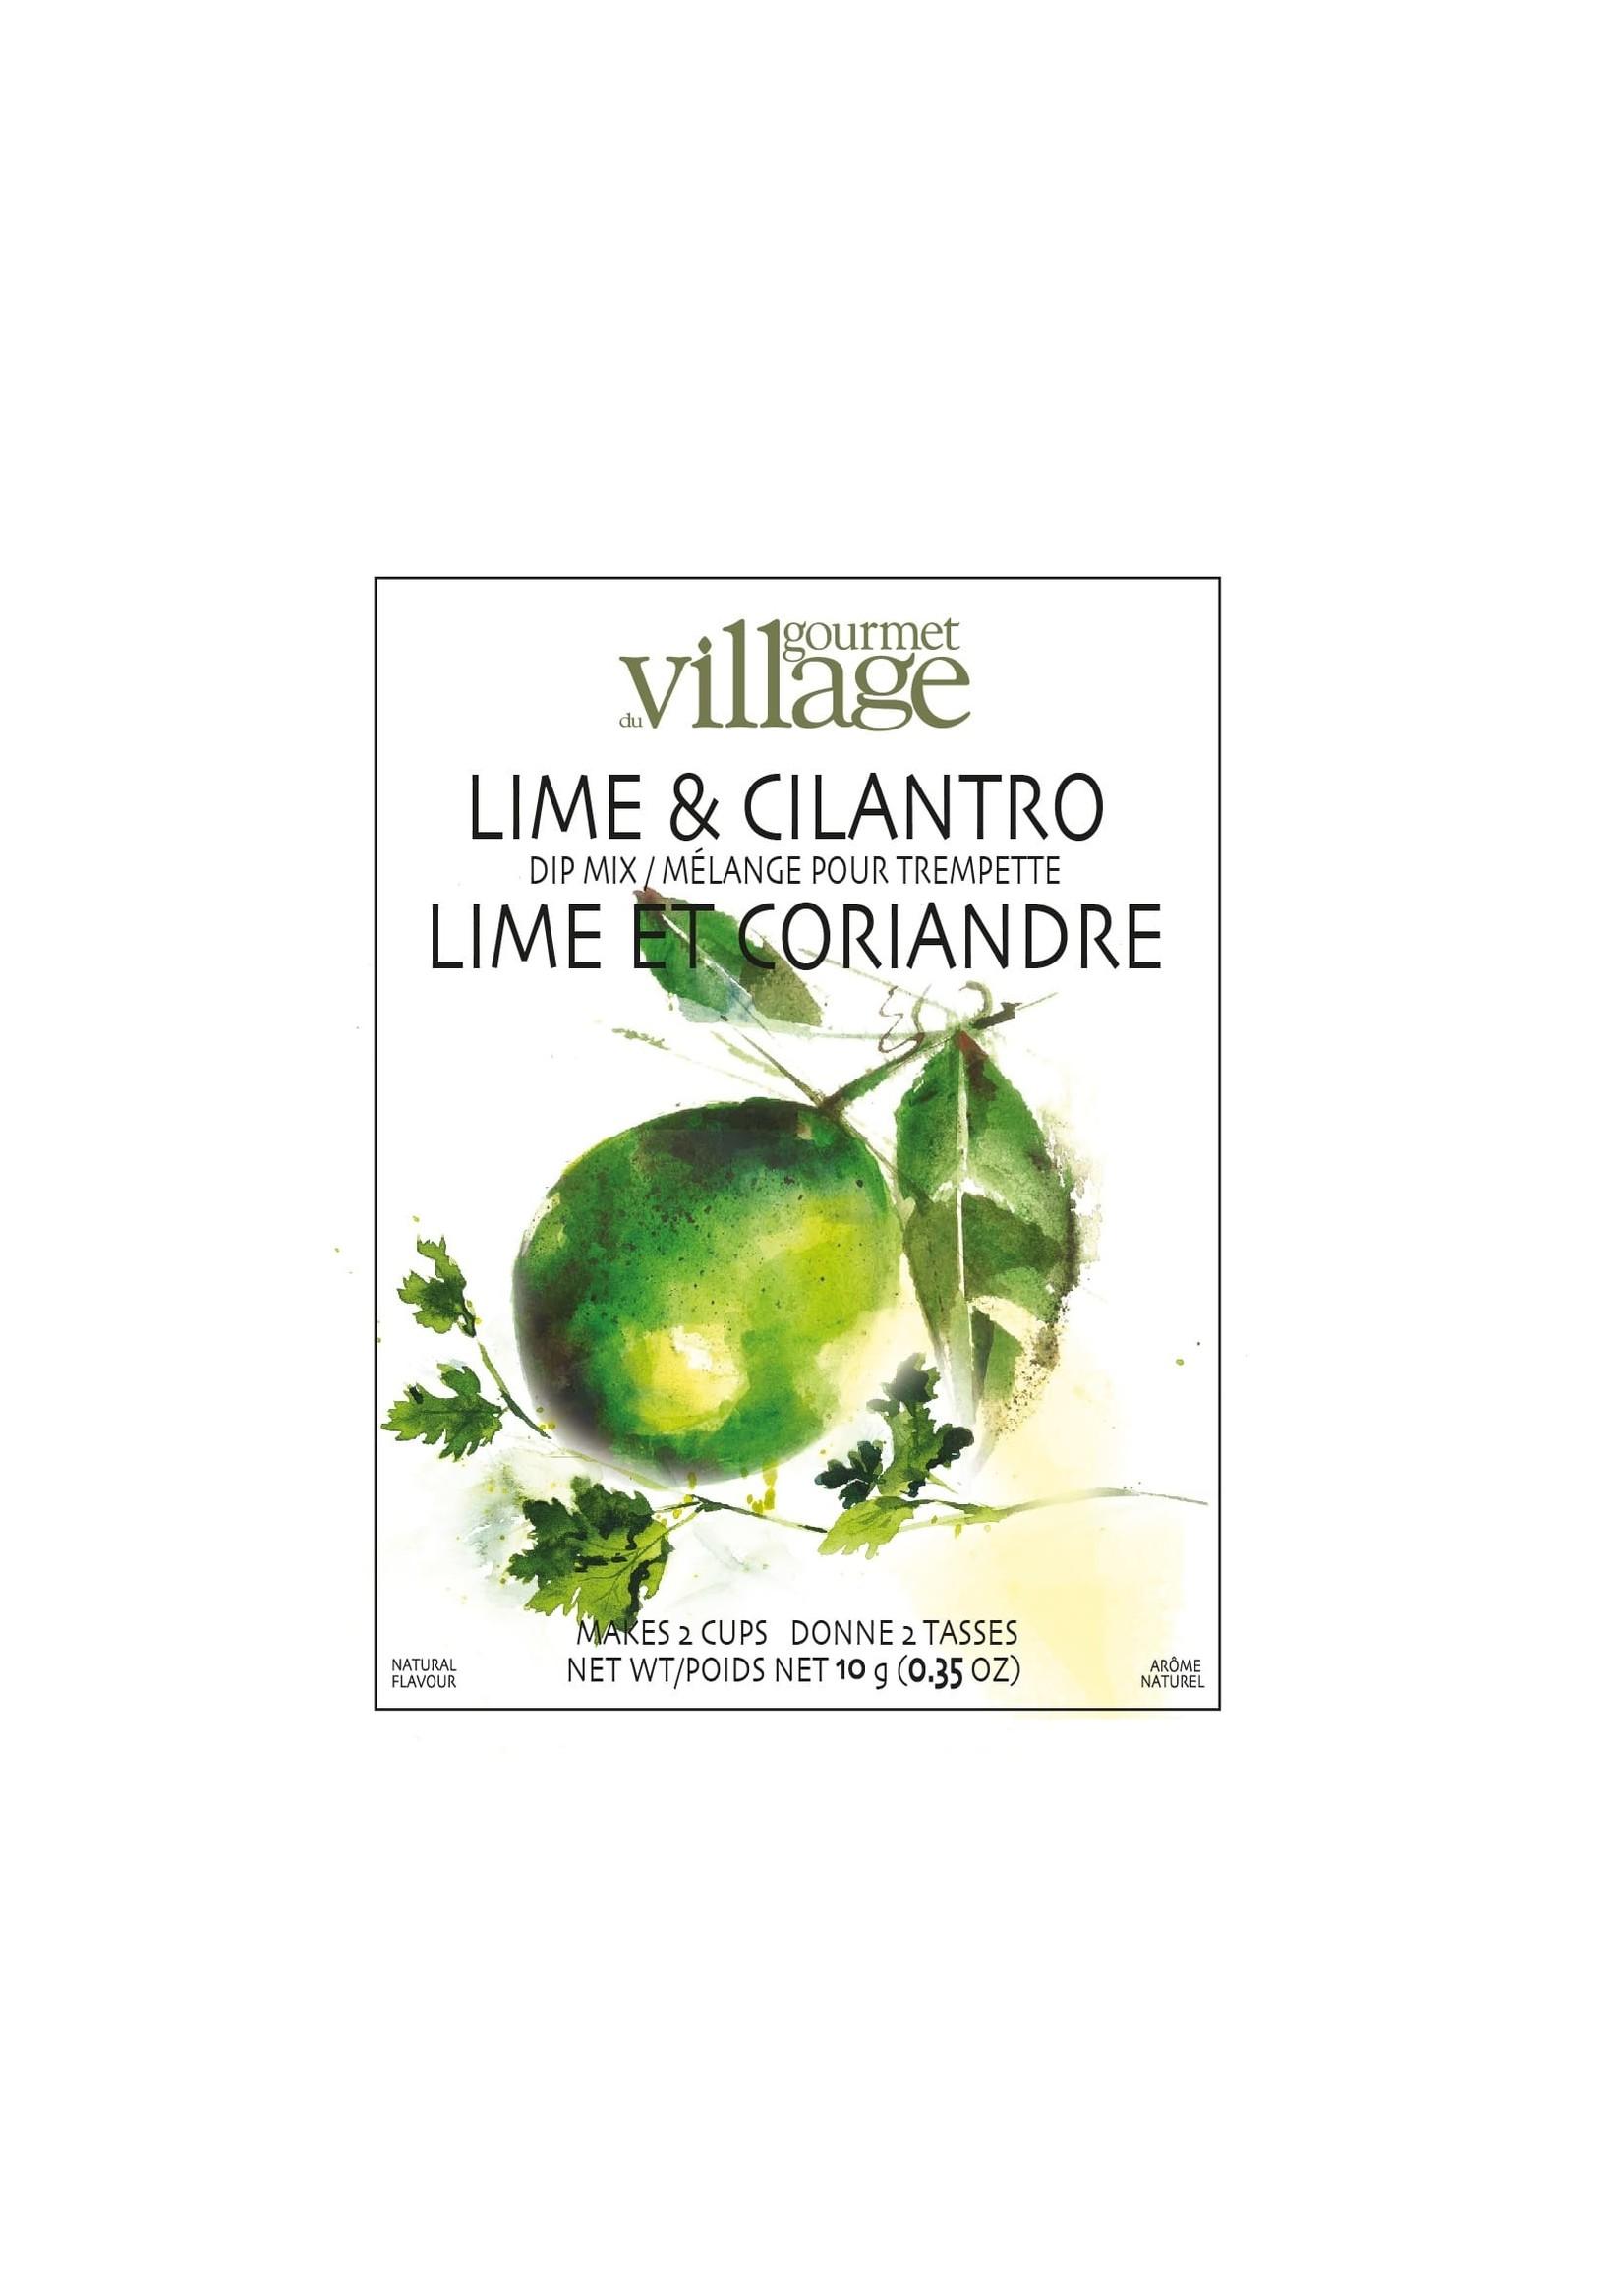 Gourmet Village Lime Cilantro Mix